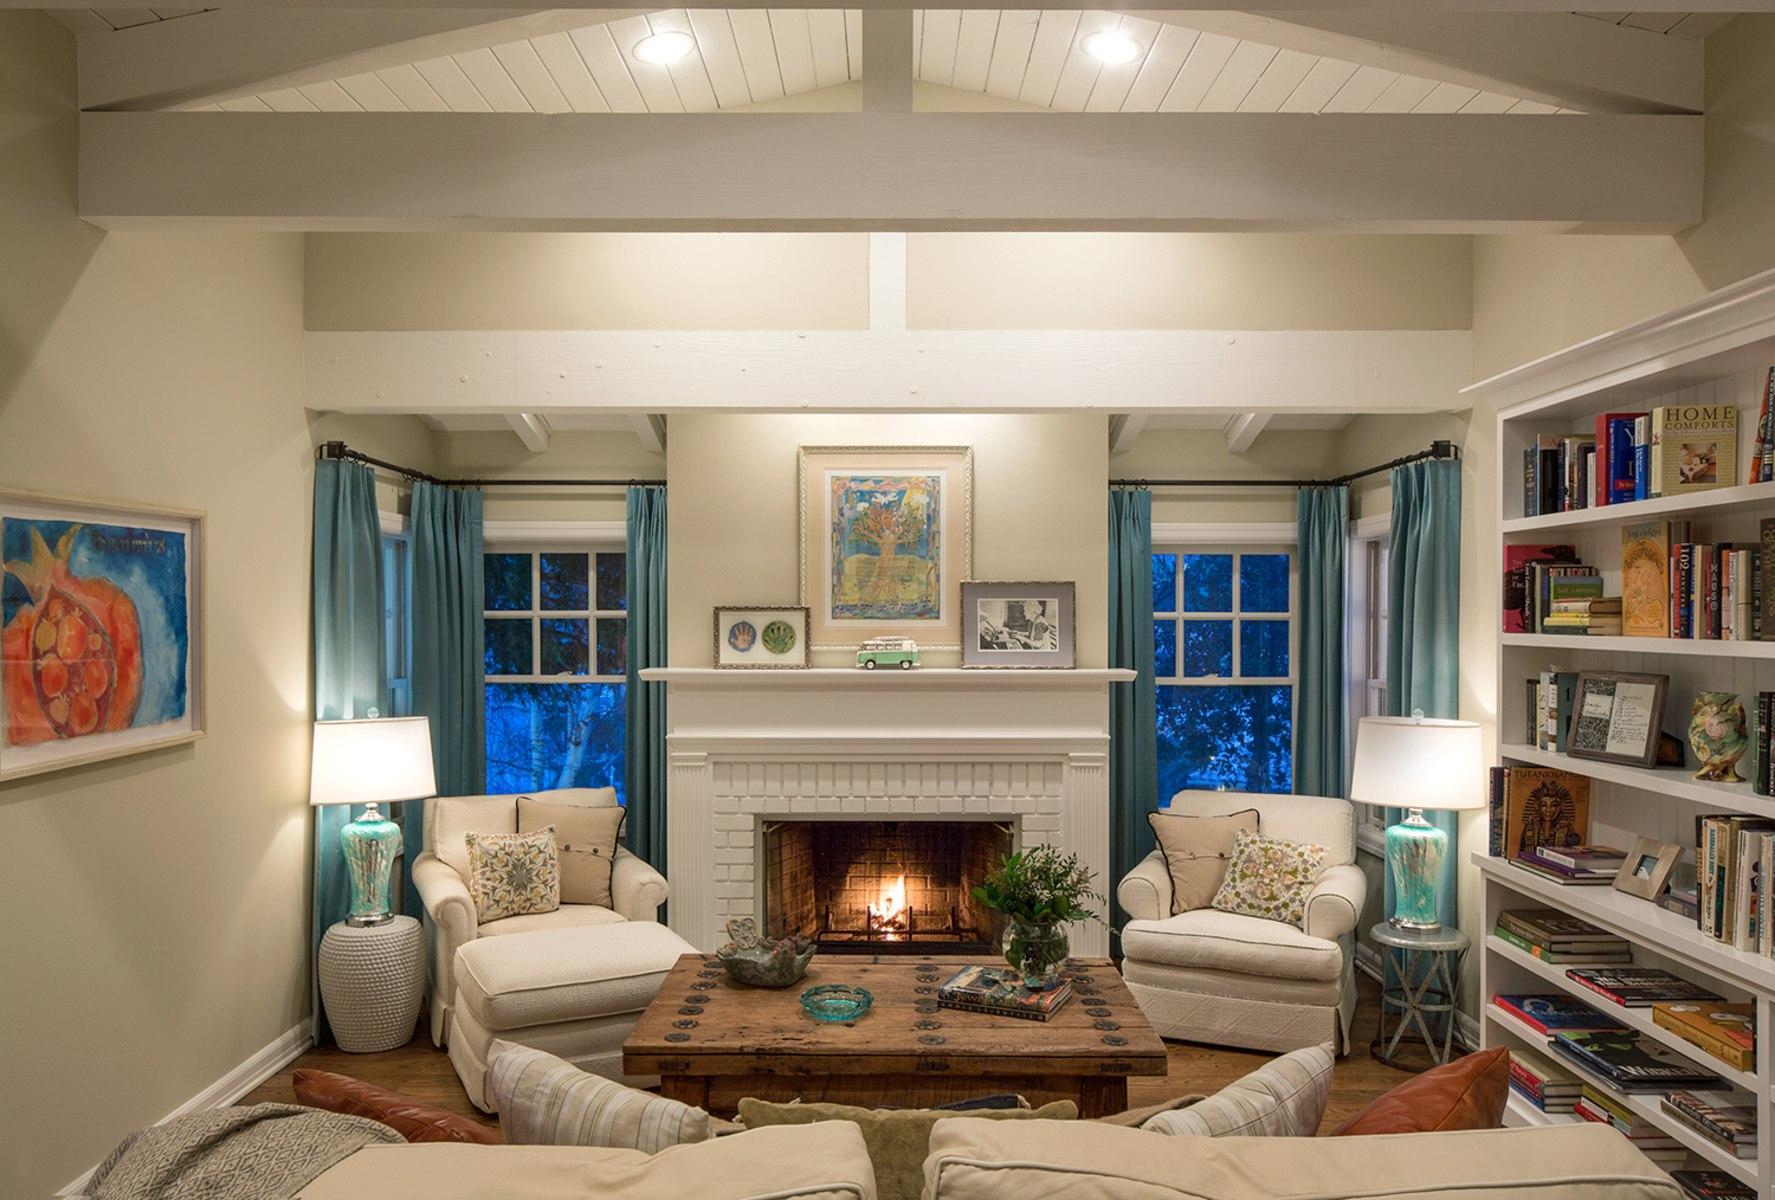 Home interior design rules - 12 Design Rules